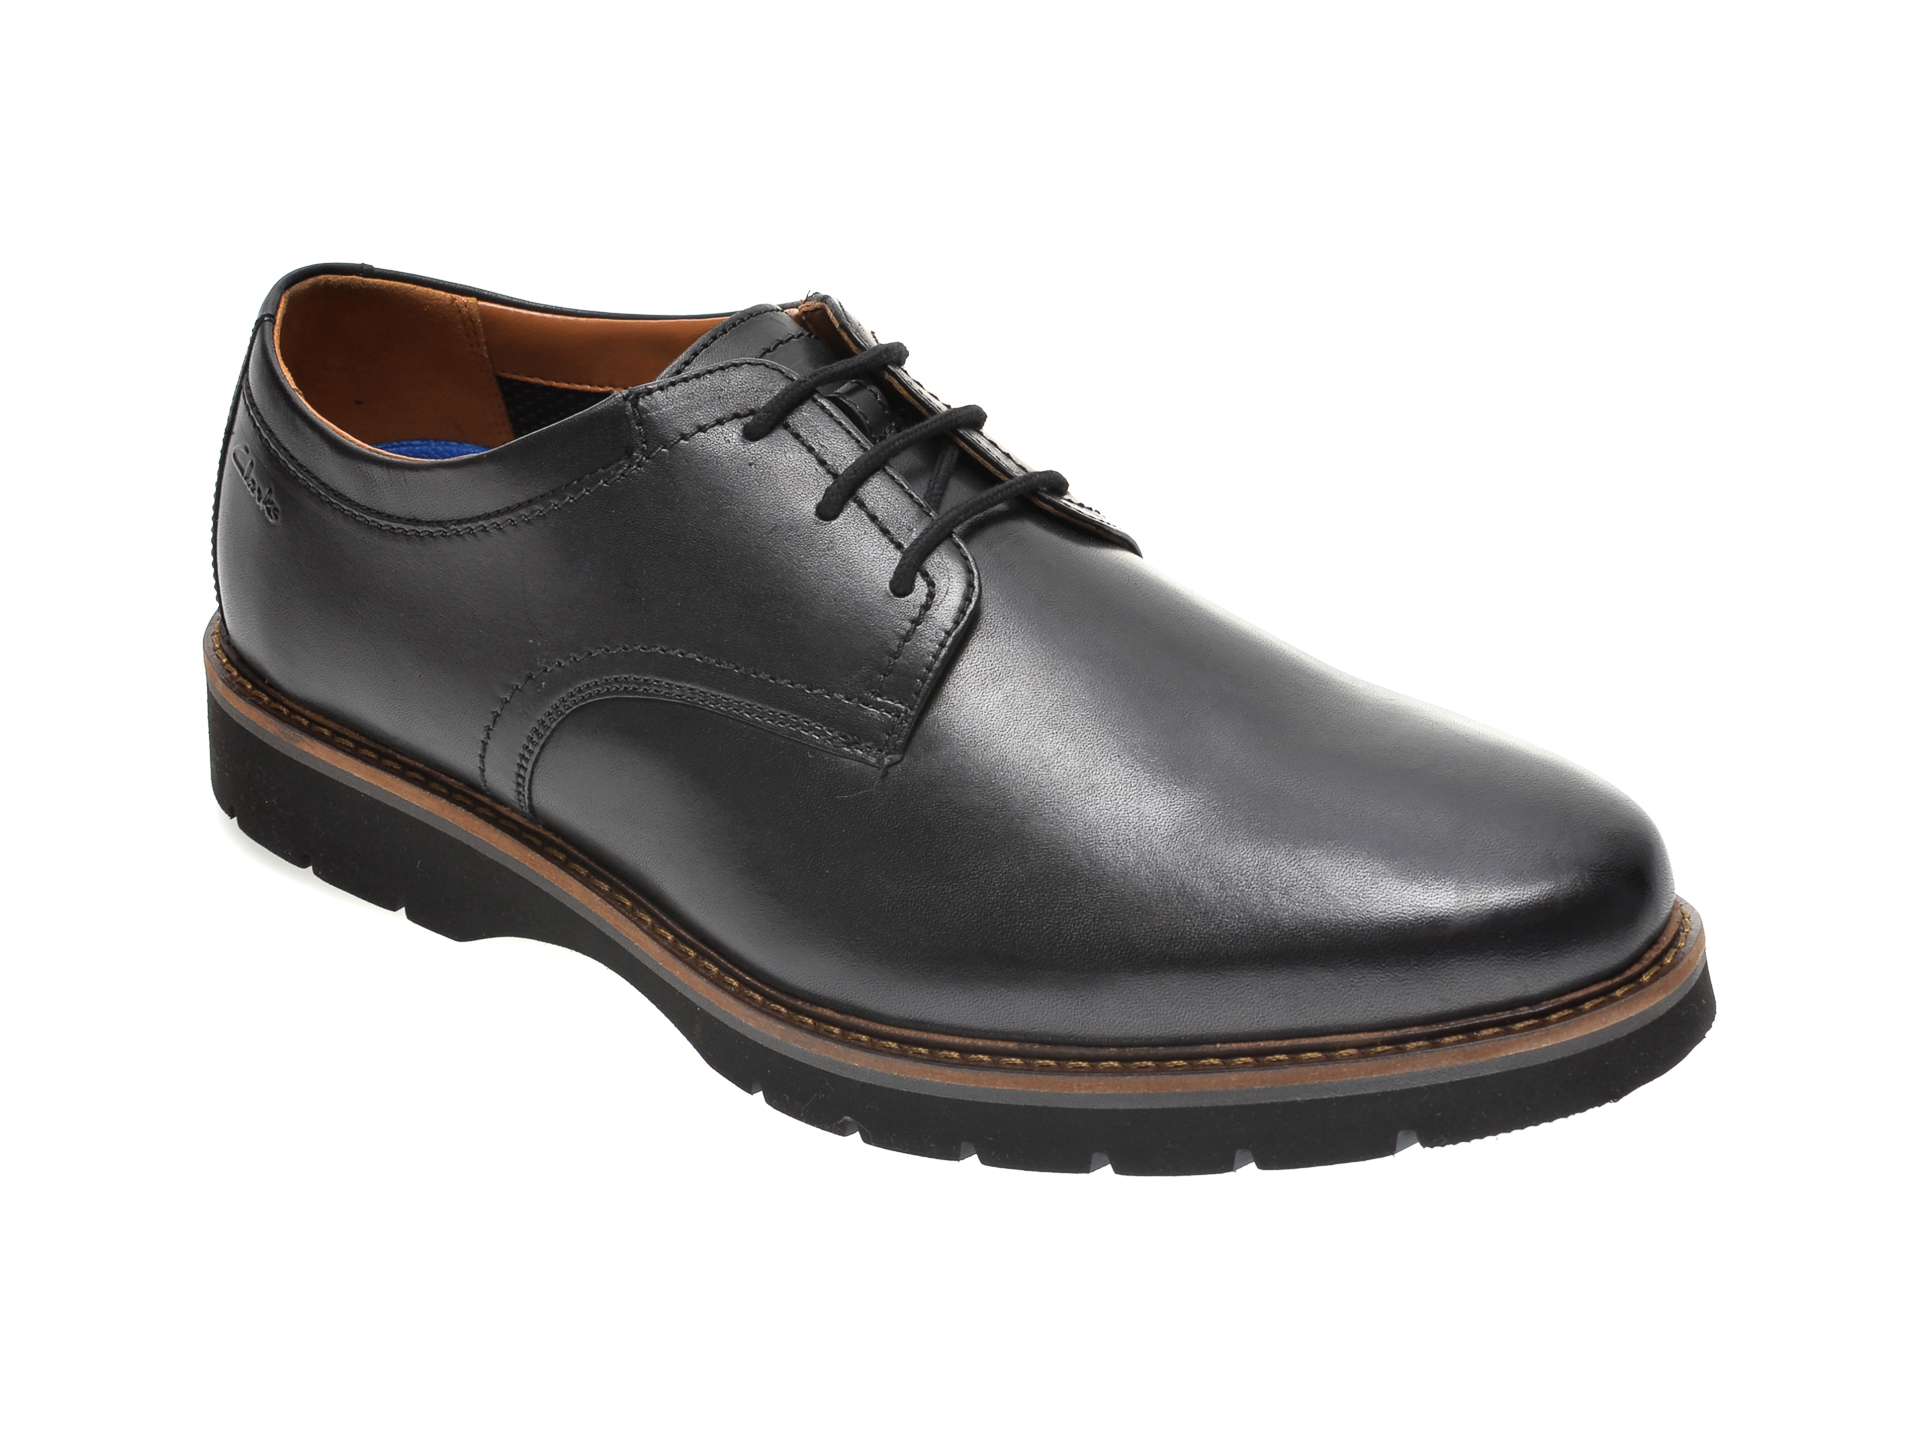 Pantofi CLARKS negri, BAYHILL PLAIN, din piele naturala imagine